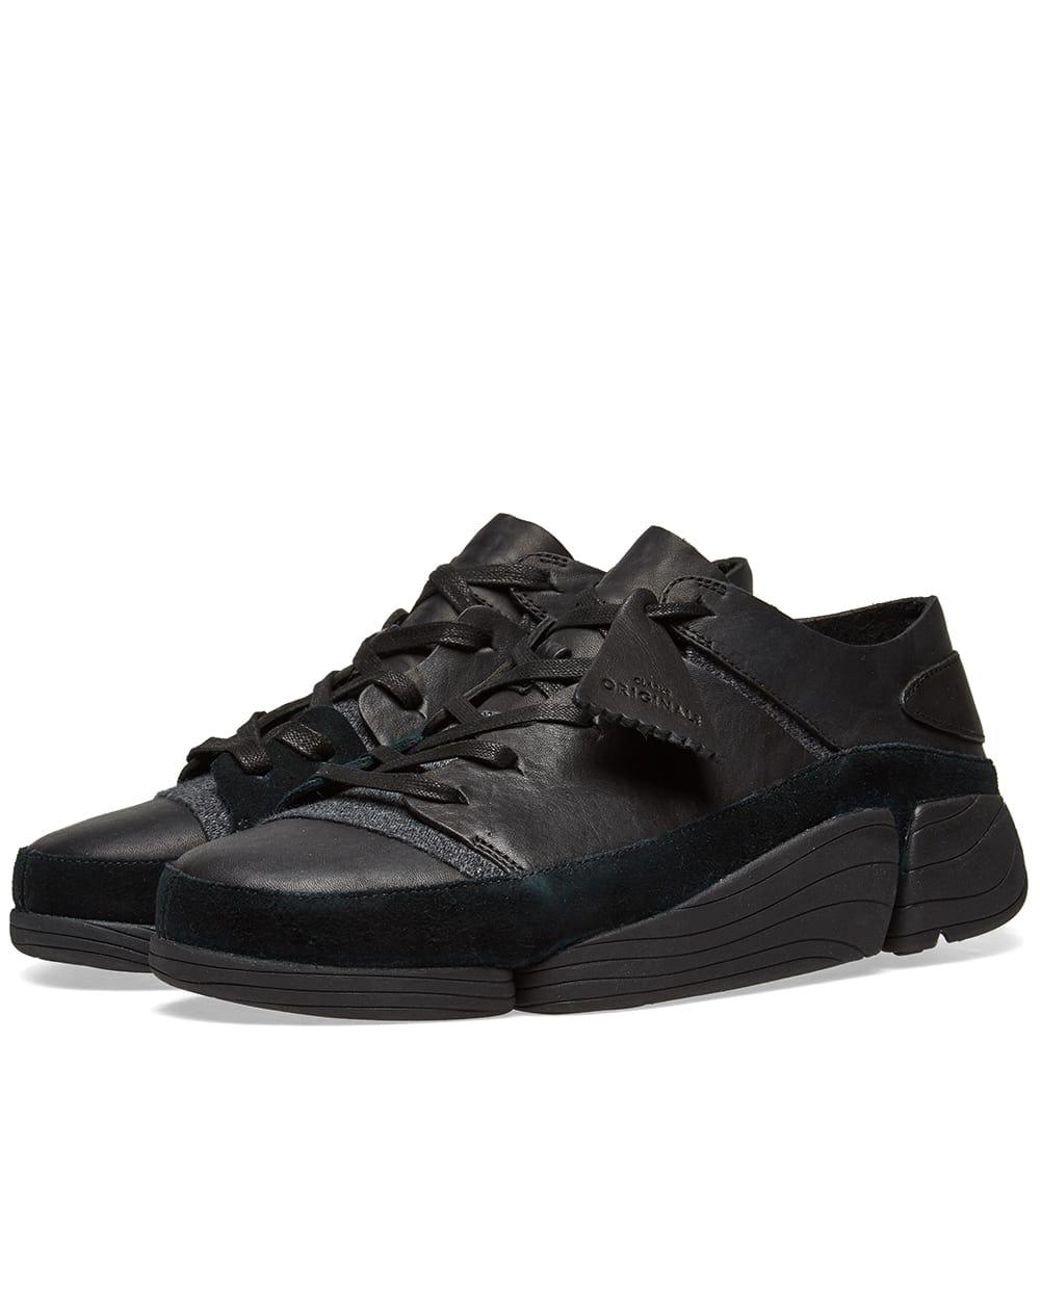 Details zu Clarks Originals Women's Trigenic Flex Shoes Fudge Nubuck Size UK 3D